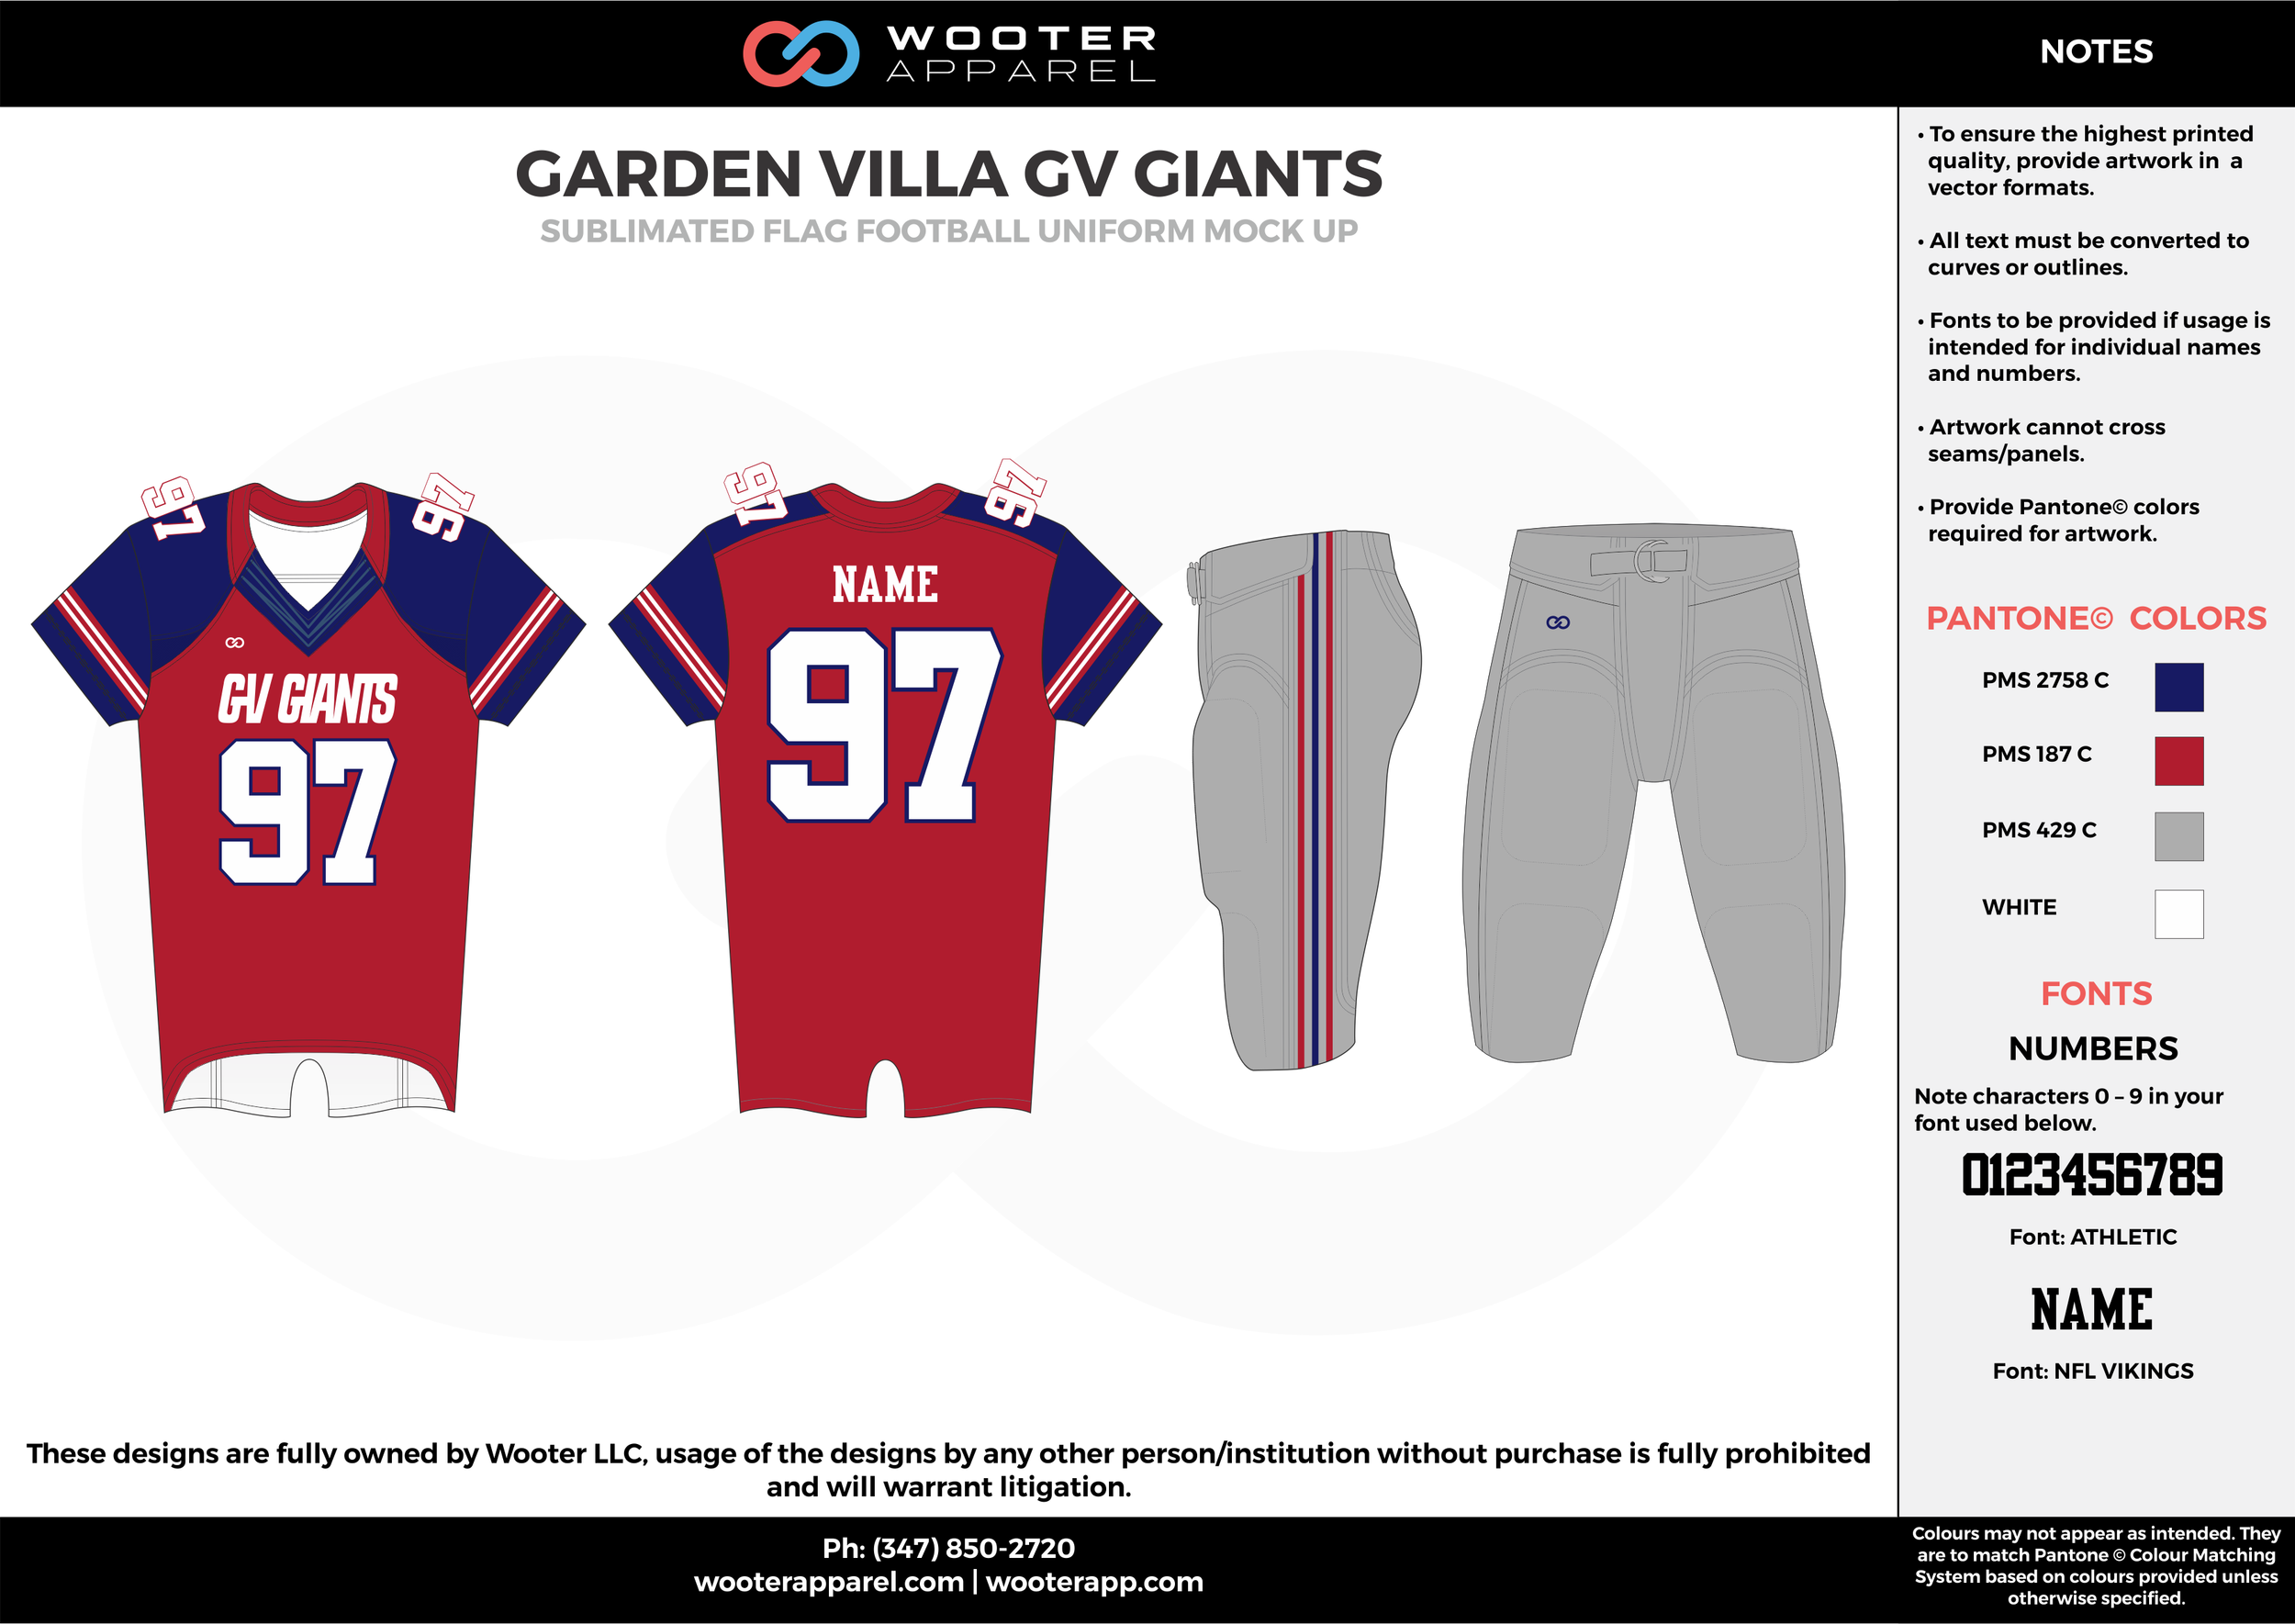 GARDEN VILLA GV GIANTS red blue gray white flag football uniforms jerseys pants